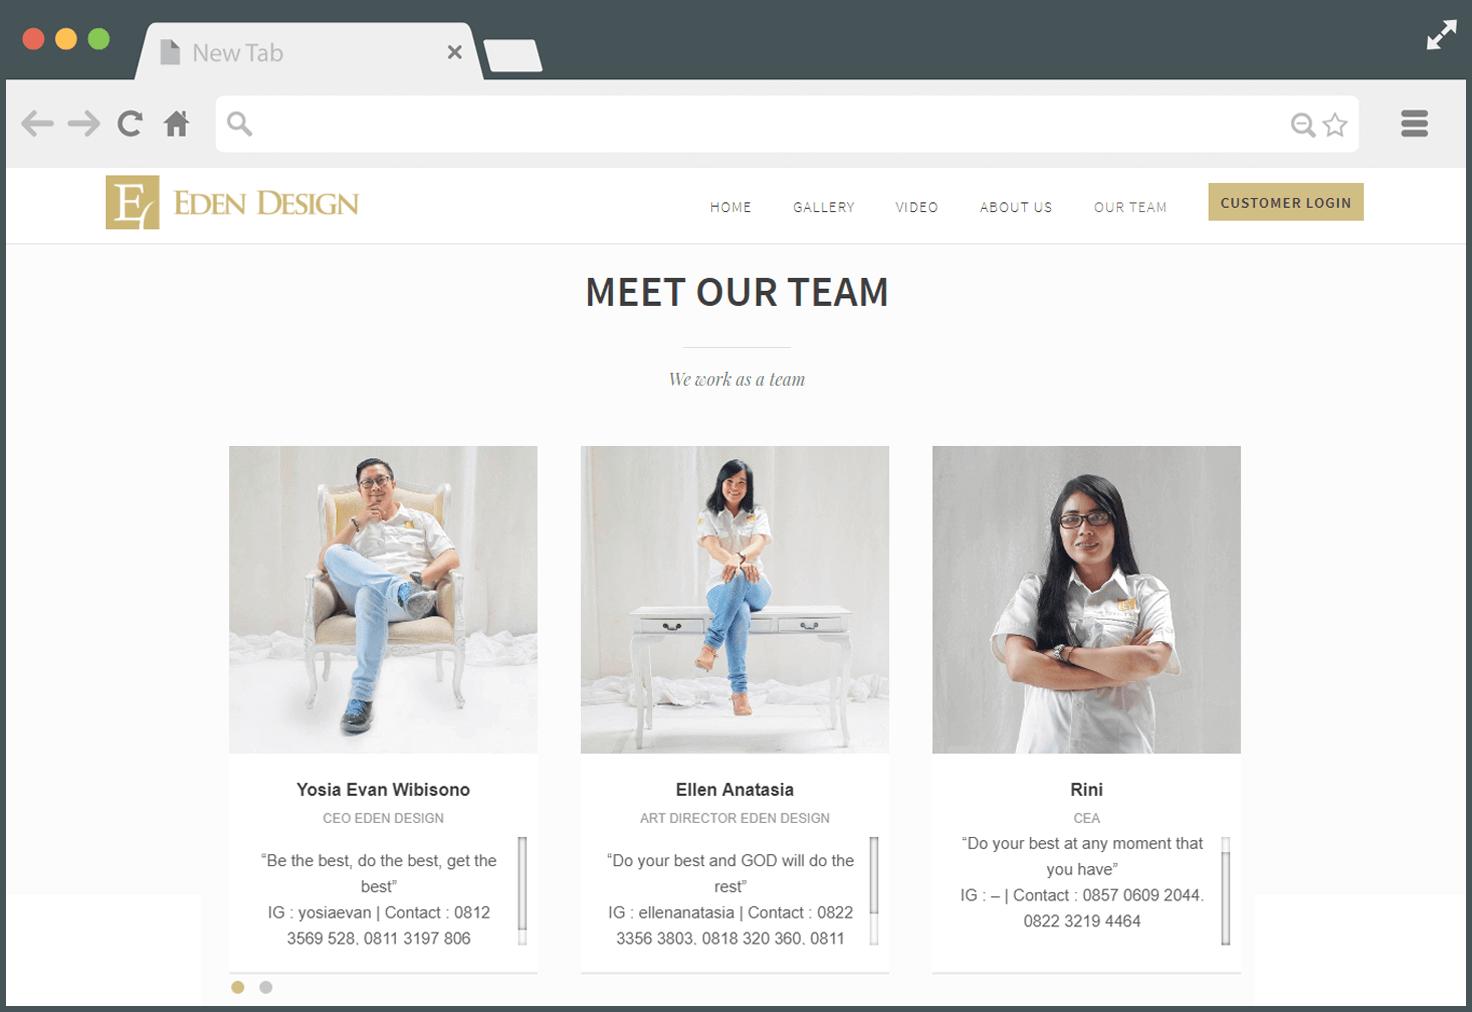 Our Team - Company Profile Website